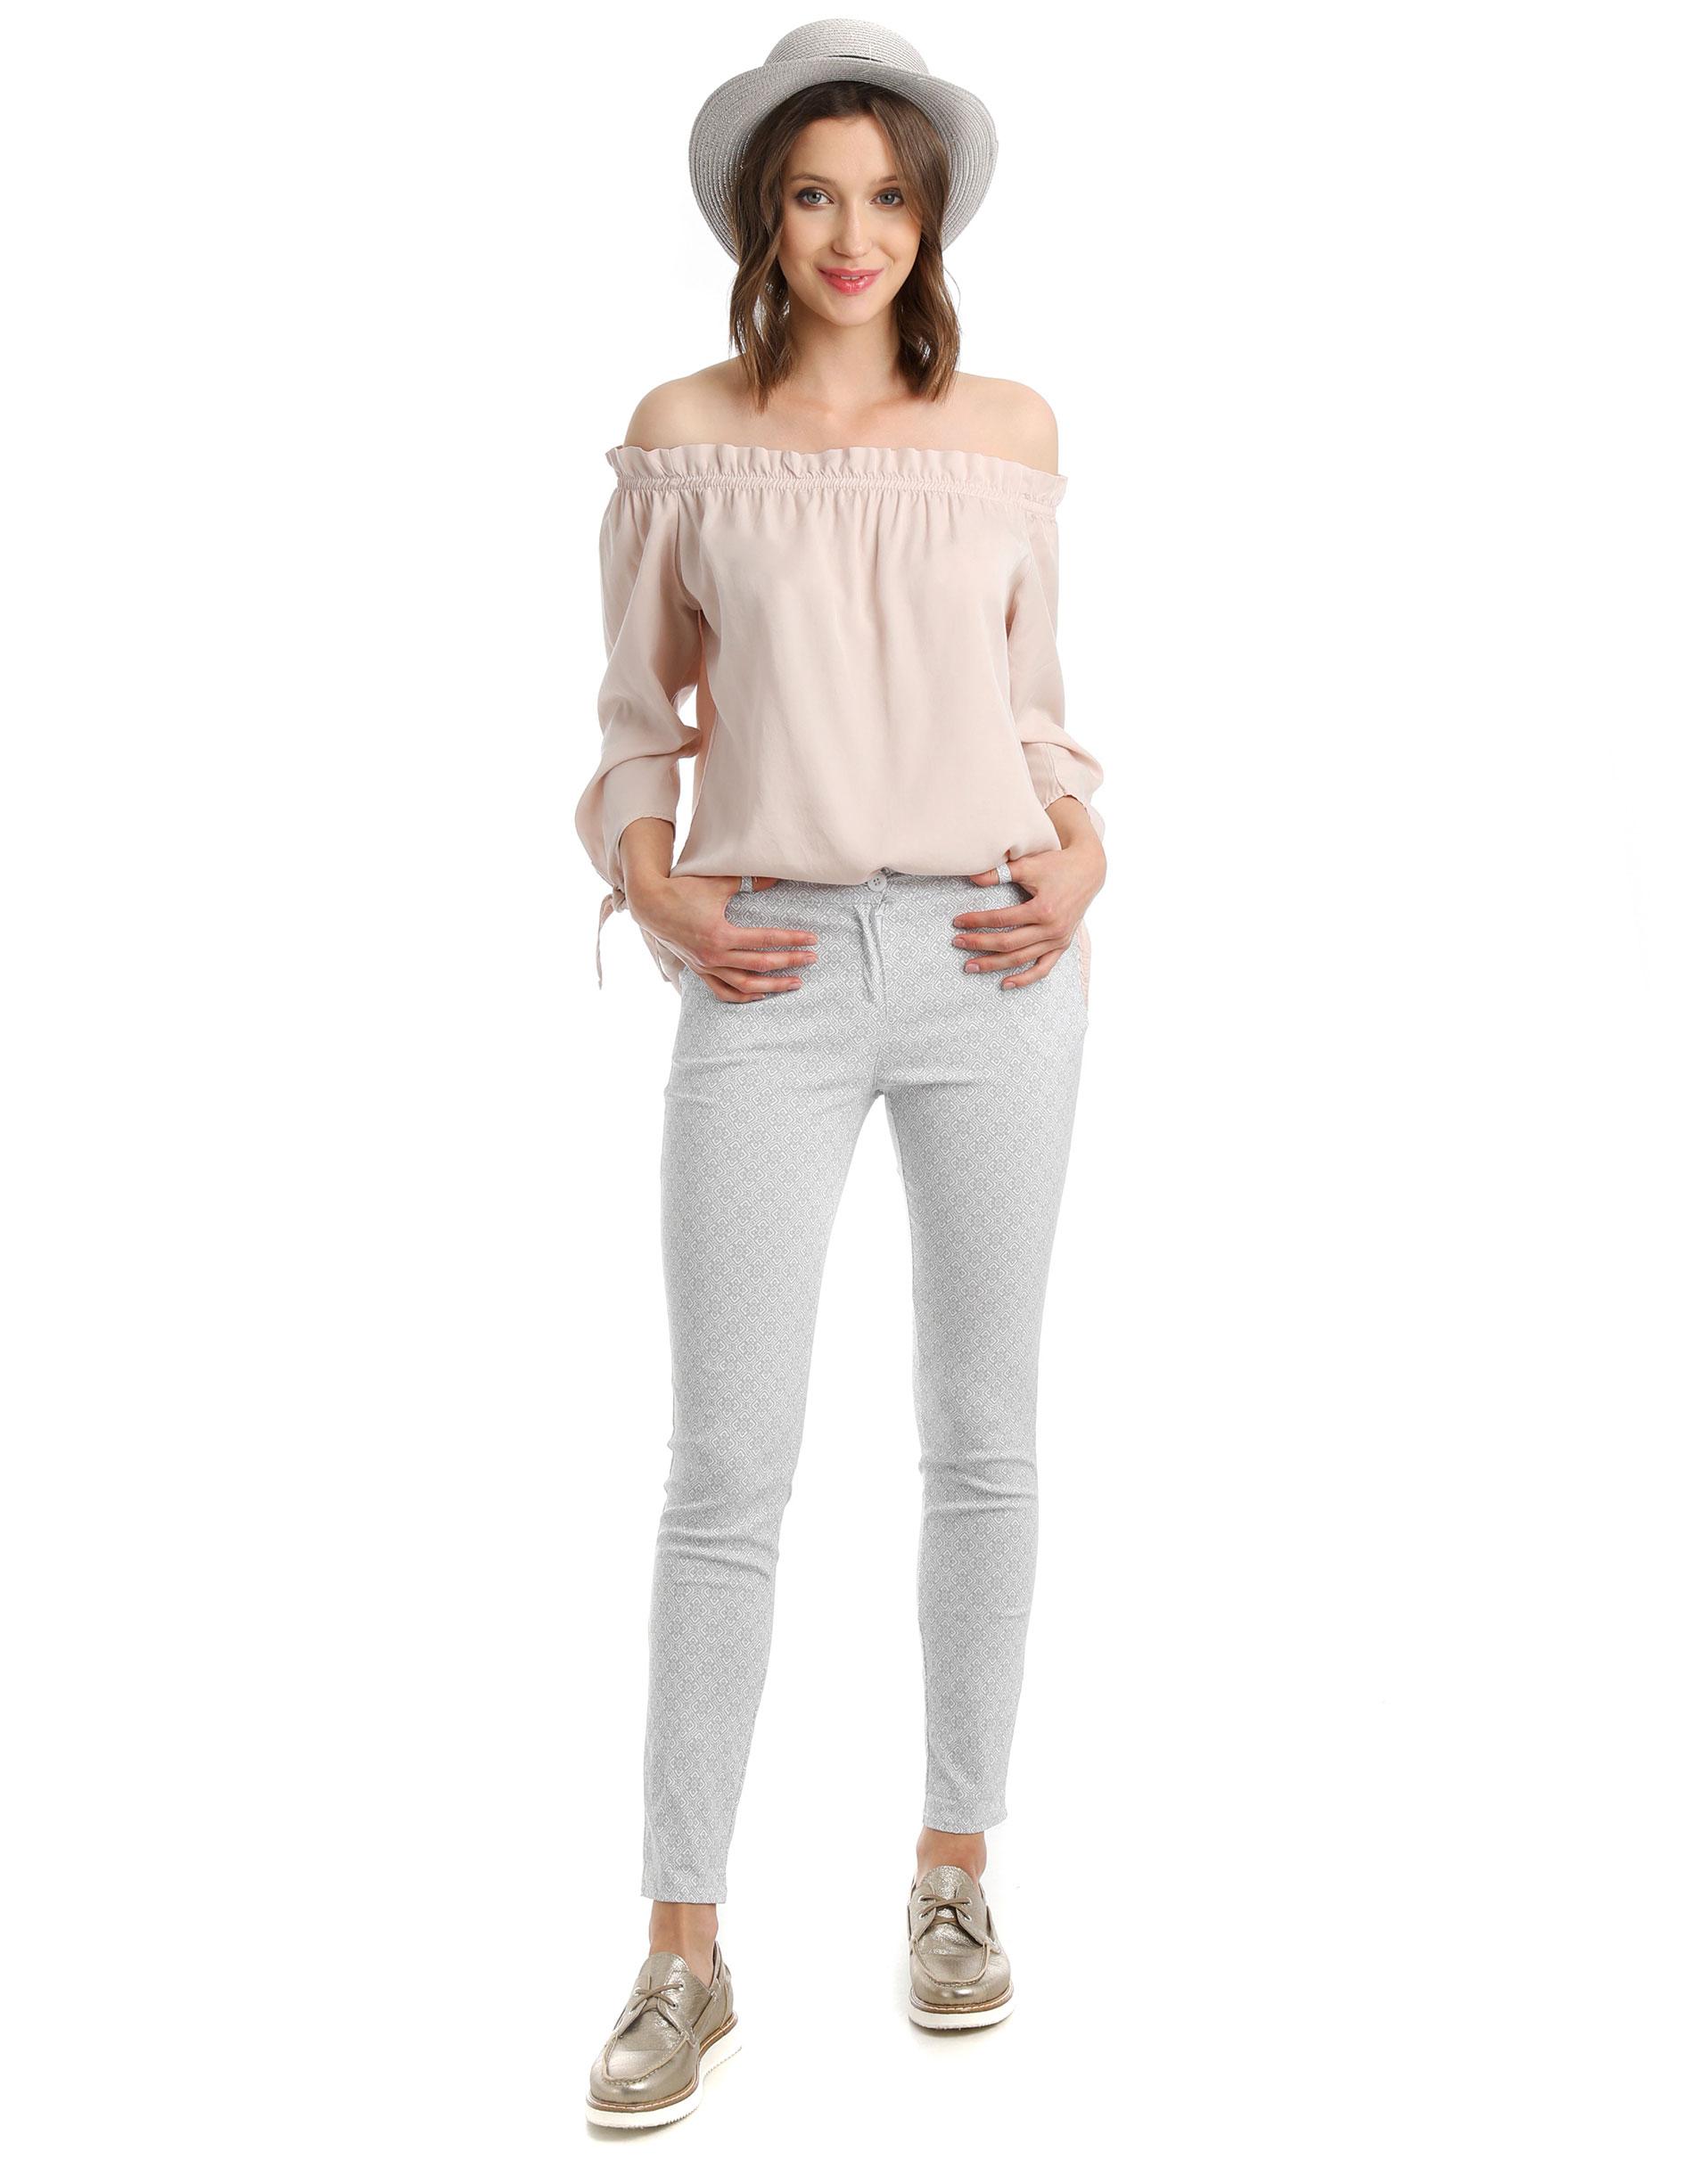 Spodnie - 10-2825D GRCH - Unisono